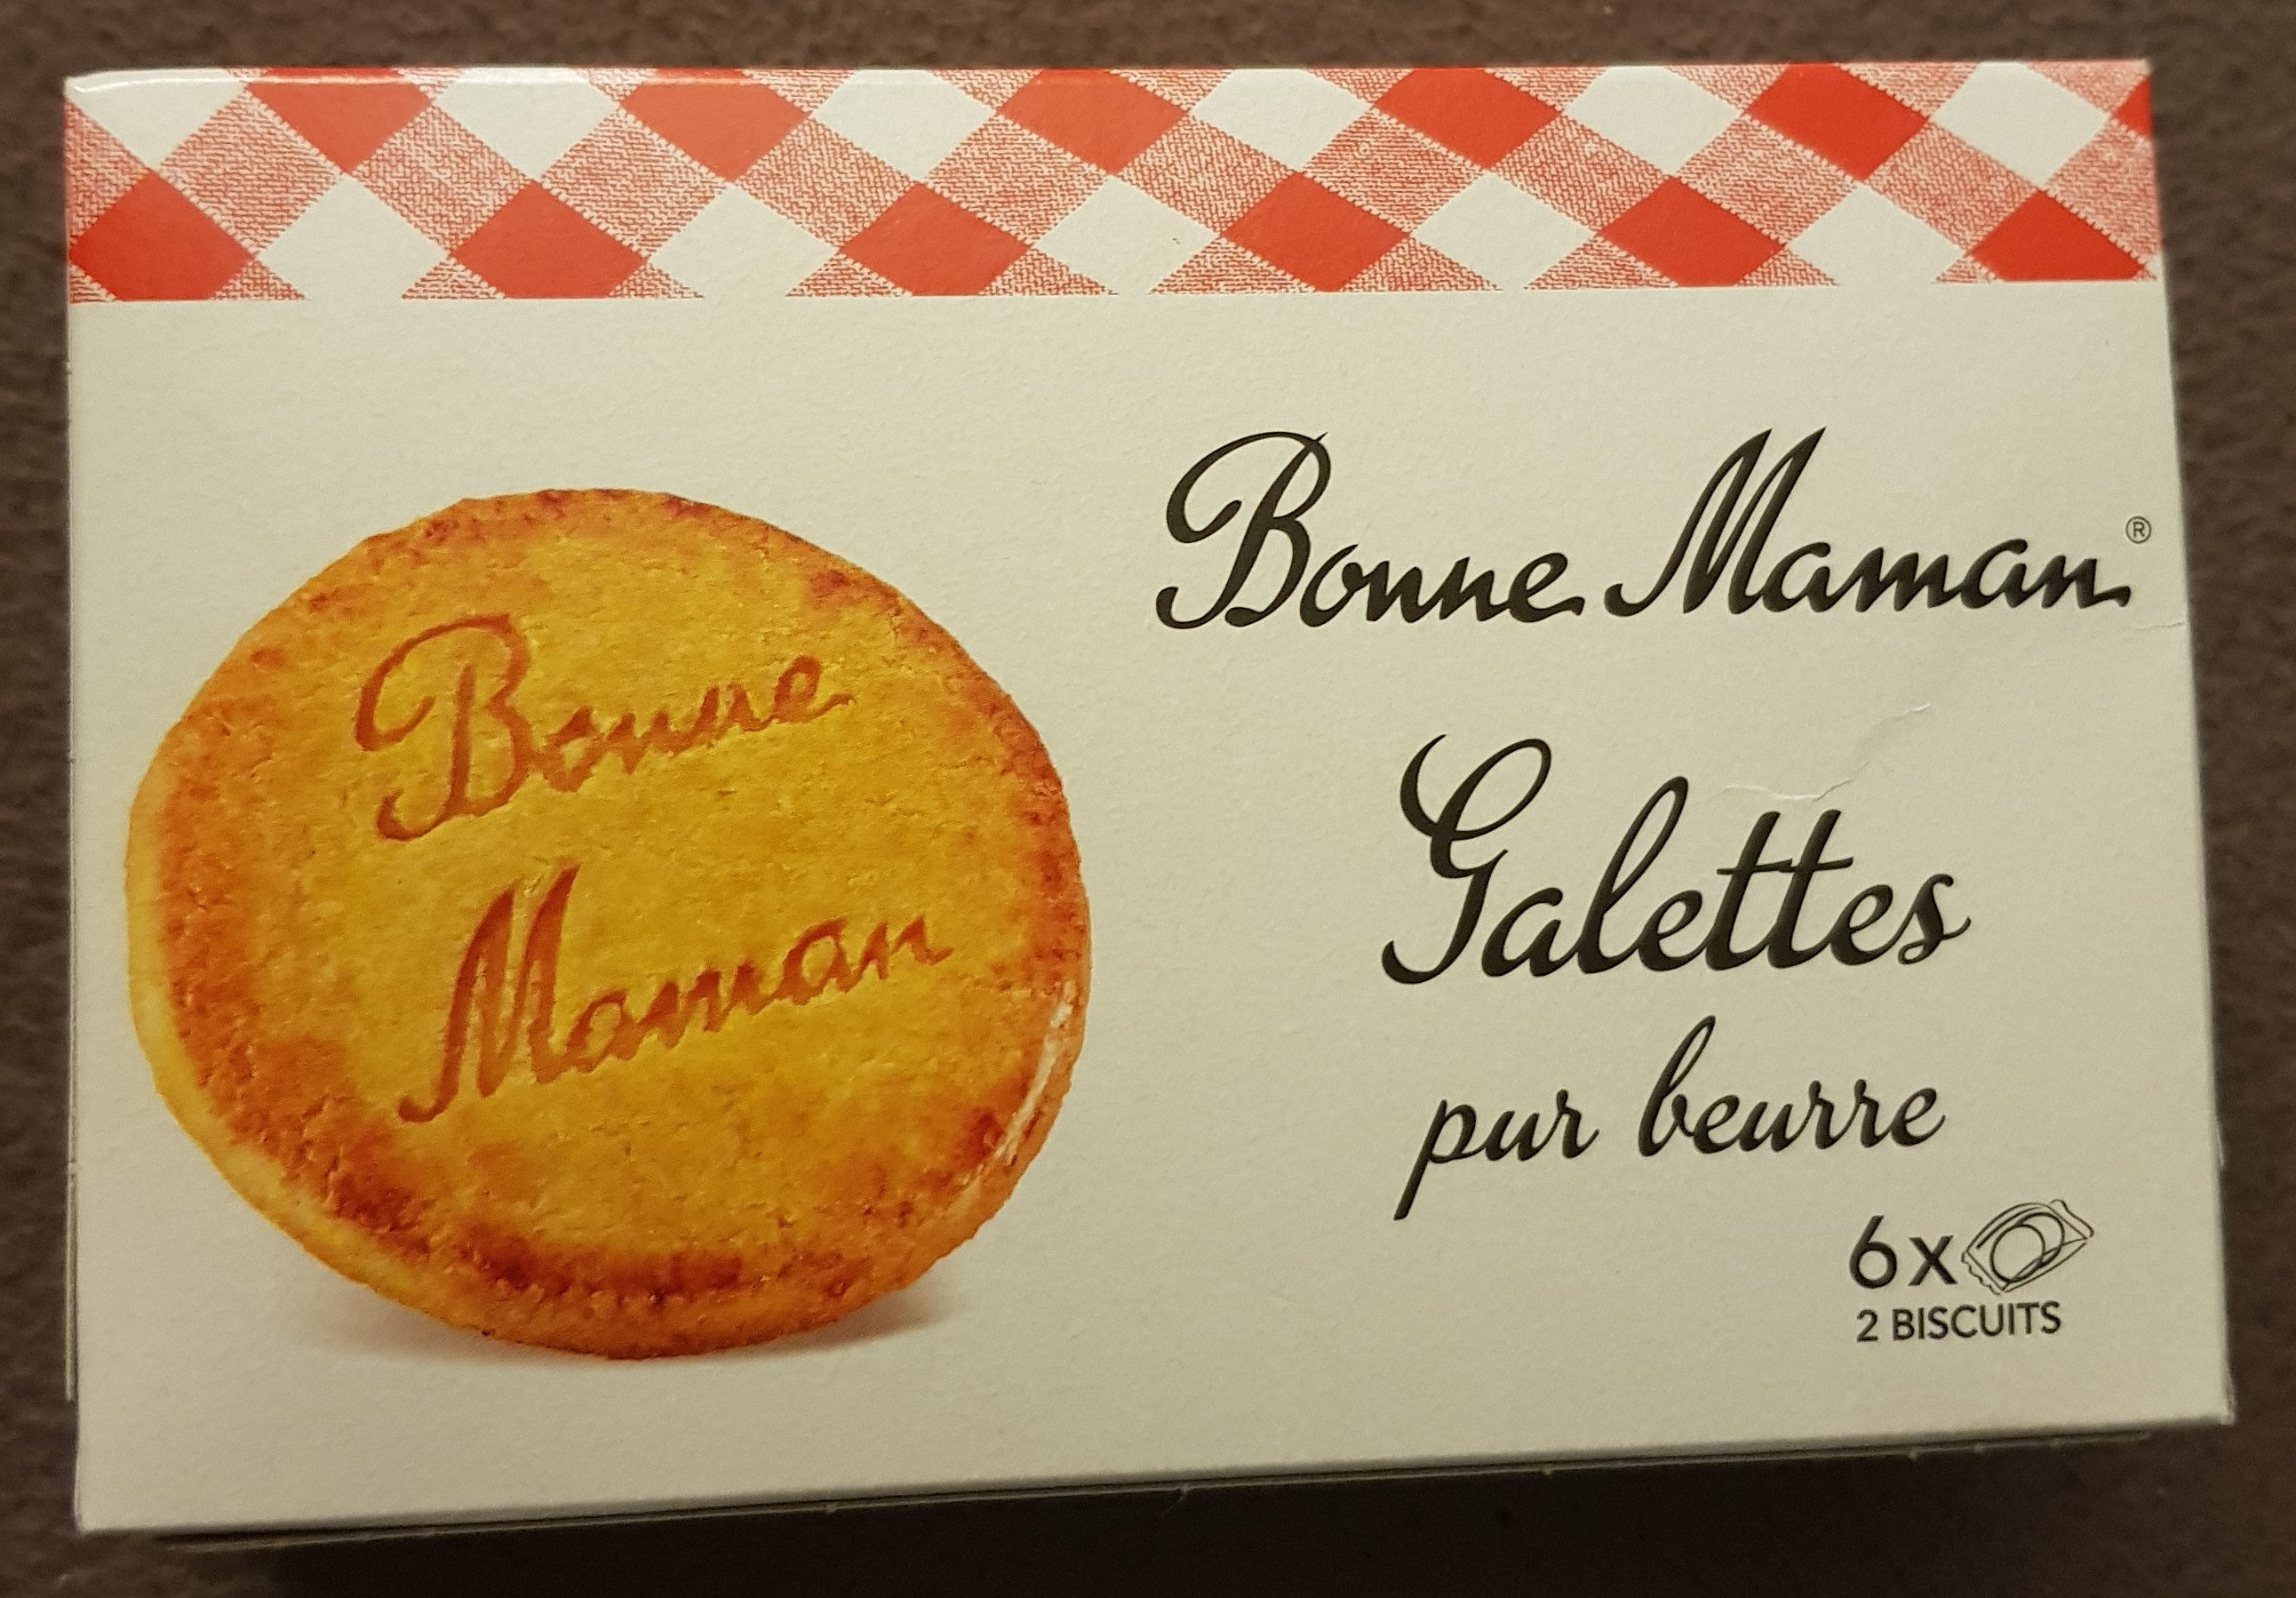 Galettes pur beurre - Produkt - fr